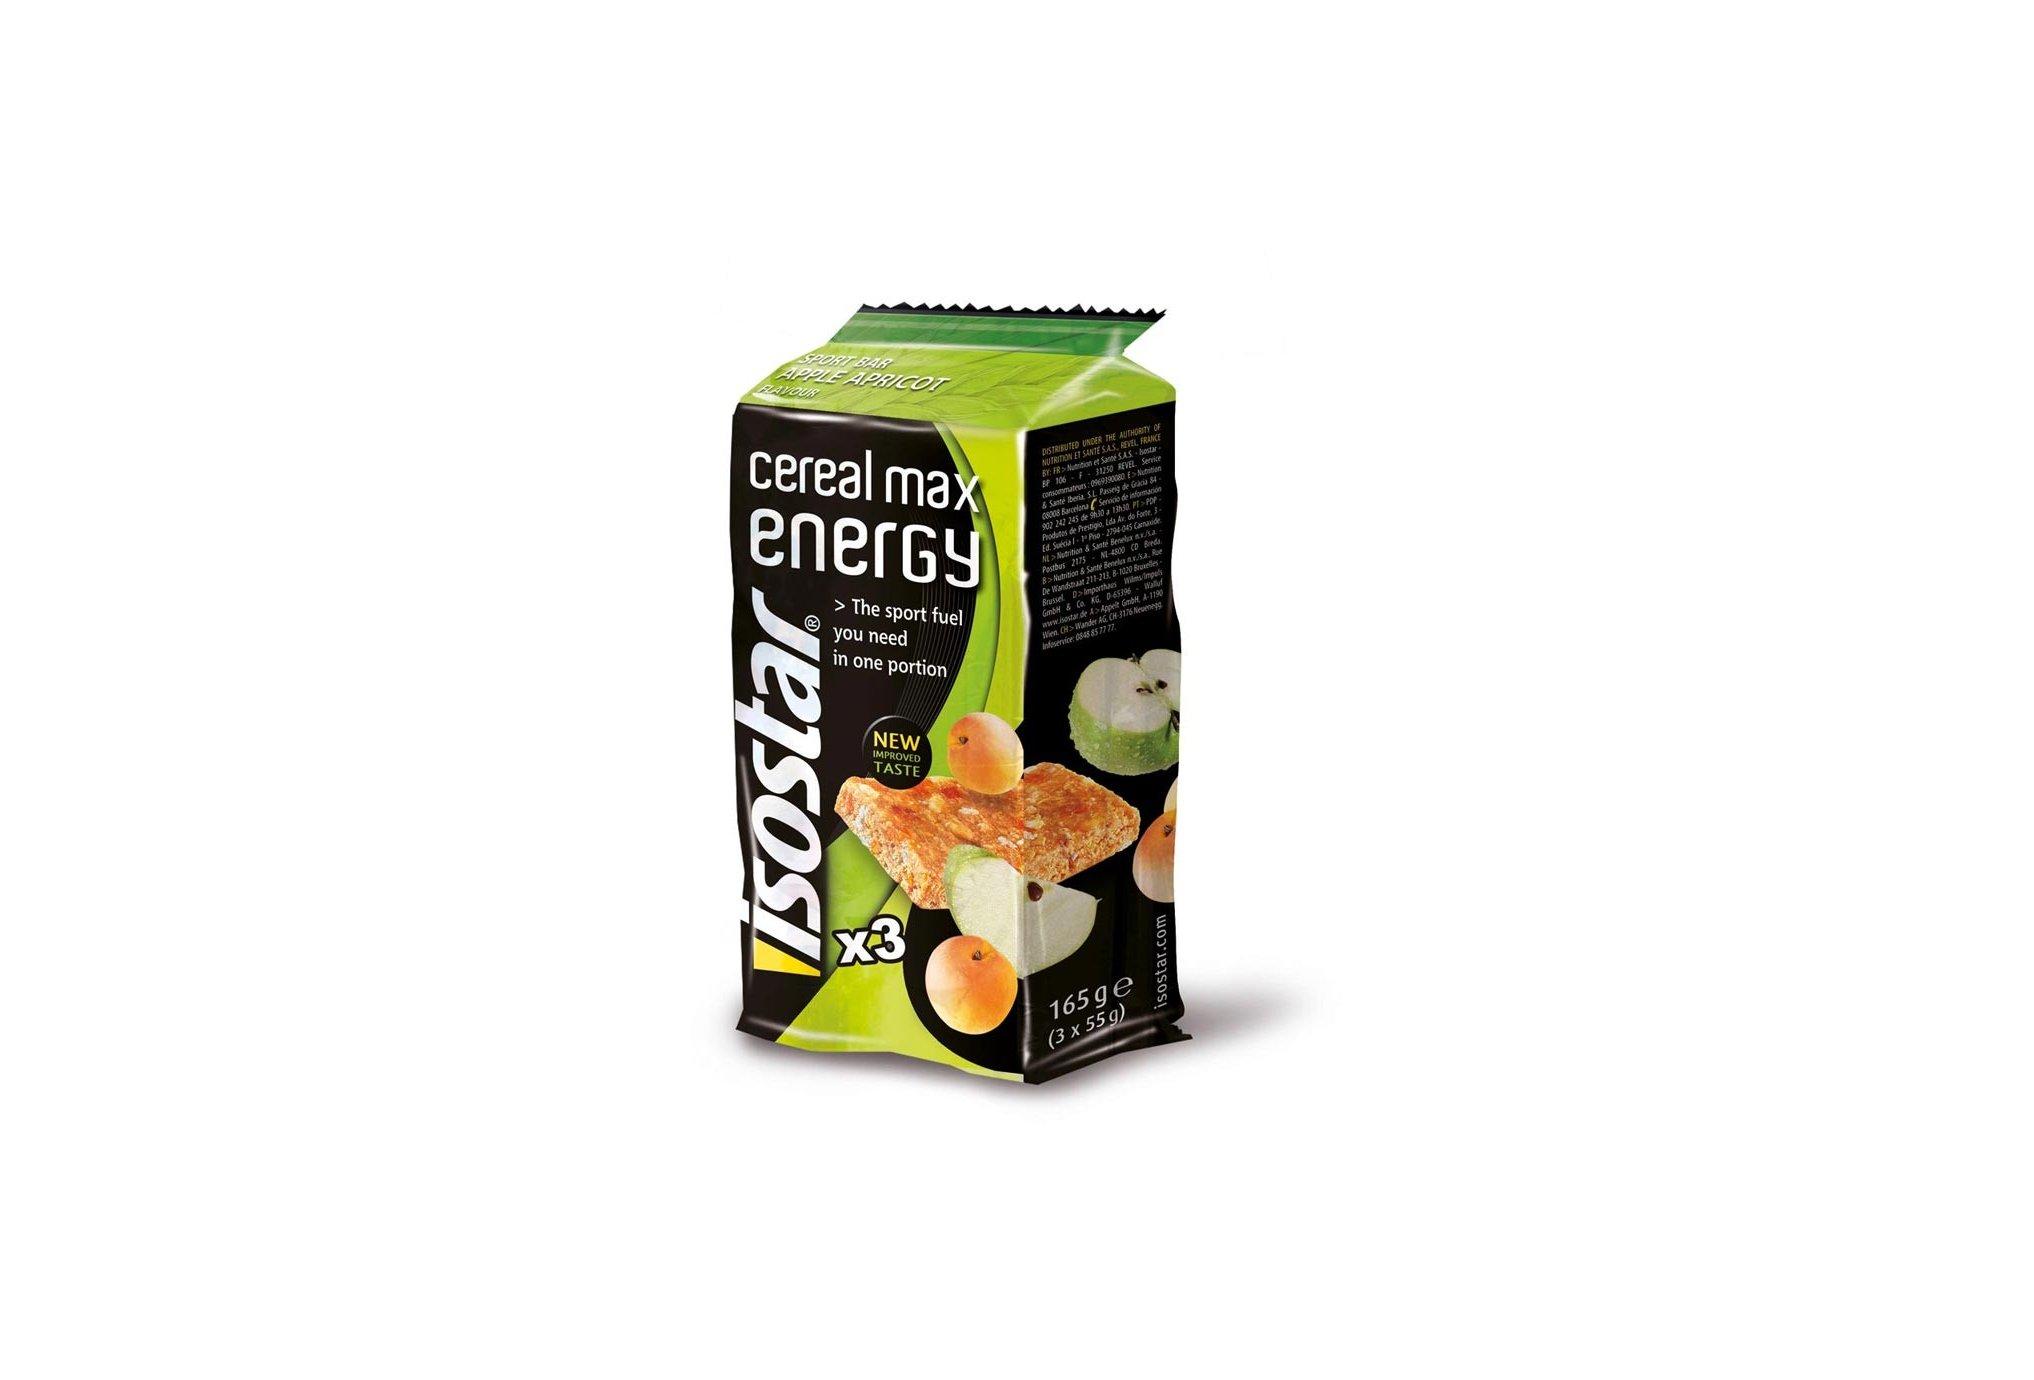 Isostar Barritas energéticas Max Energy manzana/albaricoque Diététique Barres